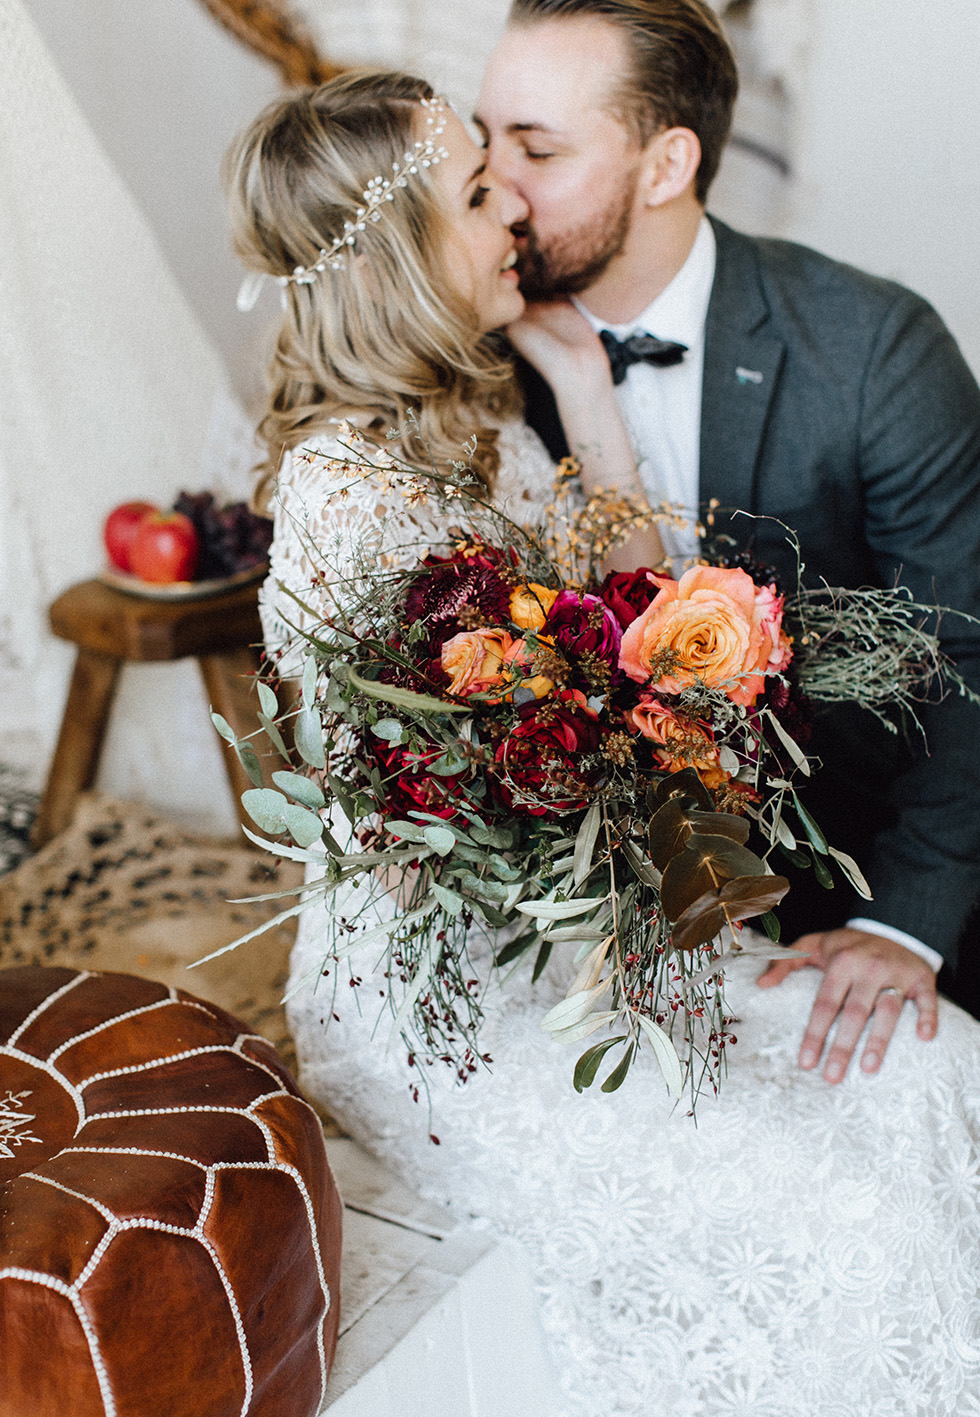 Traumanufaktur_Schloss_Diersford_Bohemian_Wedding_Boho_Hochzeit_Hochzeitsfotograf_069.jpg